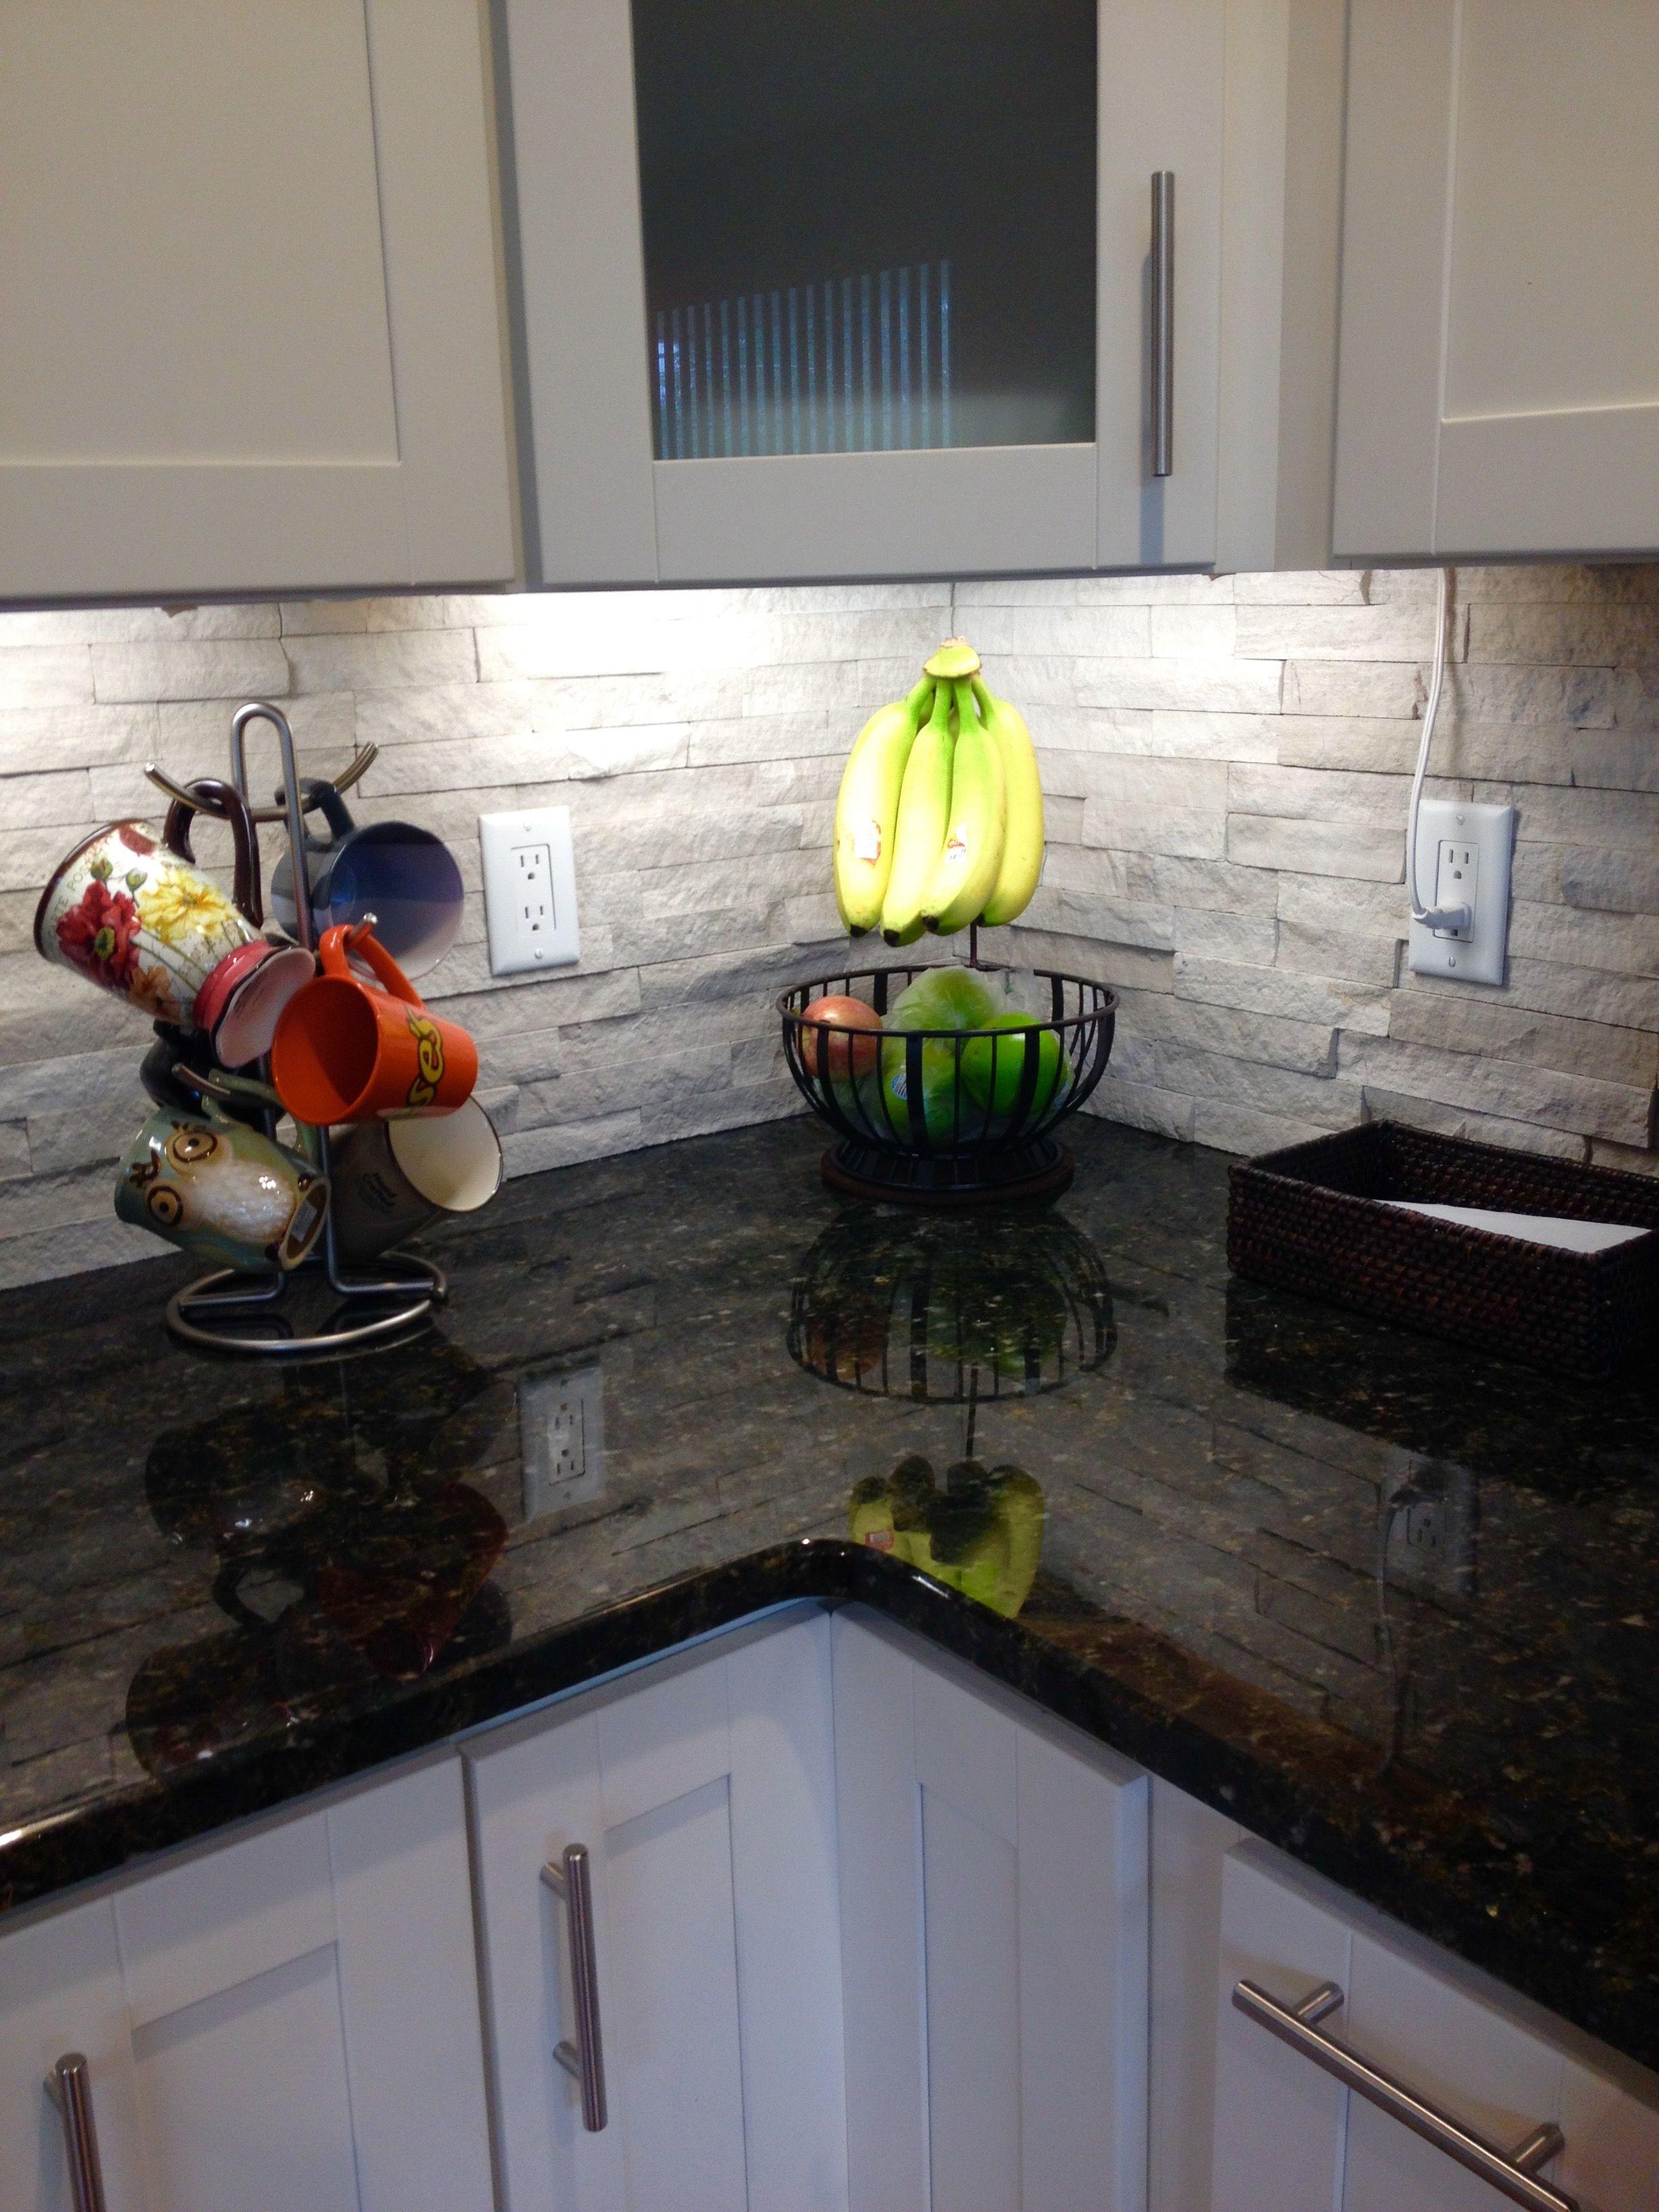 Ledger stone backsplash | Trendy kitchen backsplash ... on Backsplash For Black Granite Countertops And White Cabinets  id=23764